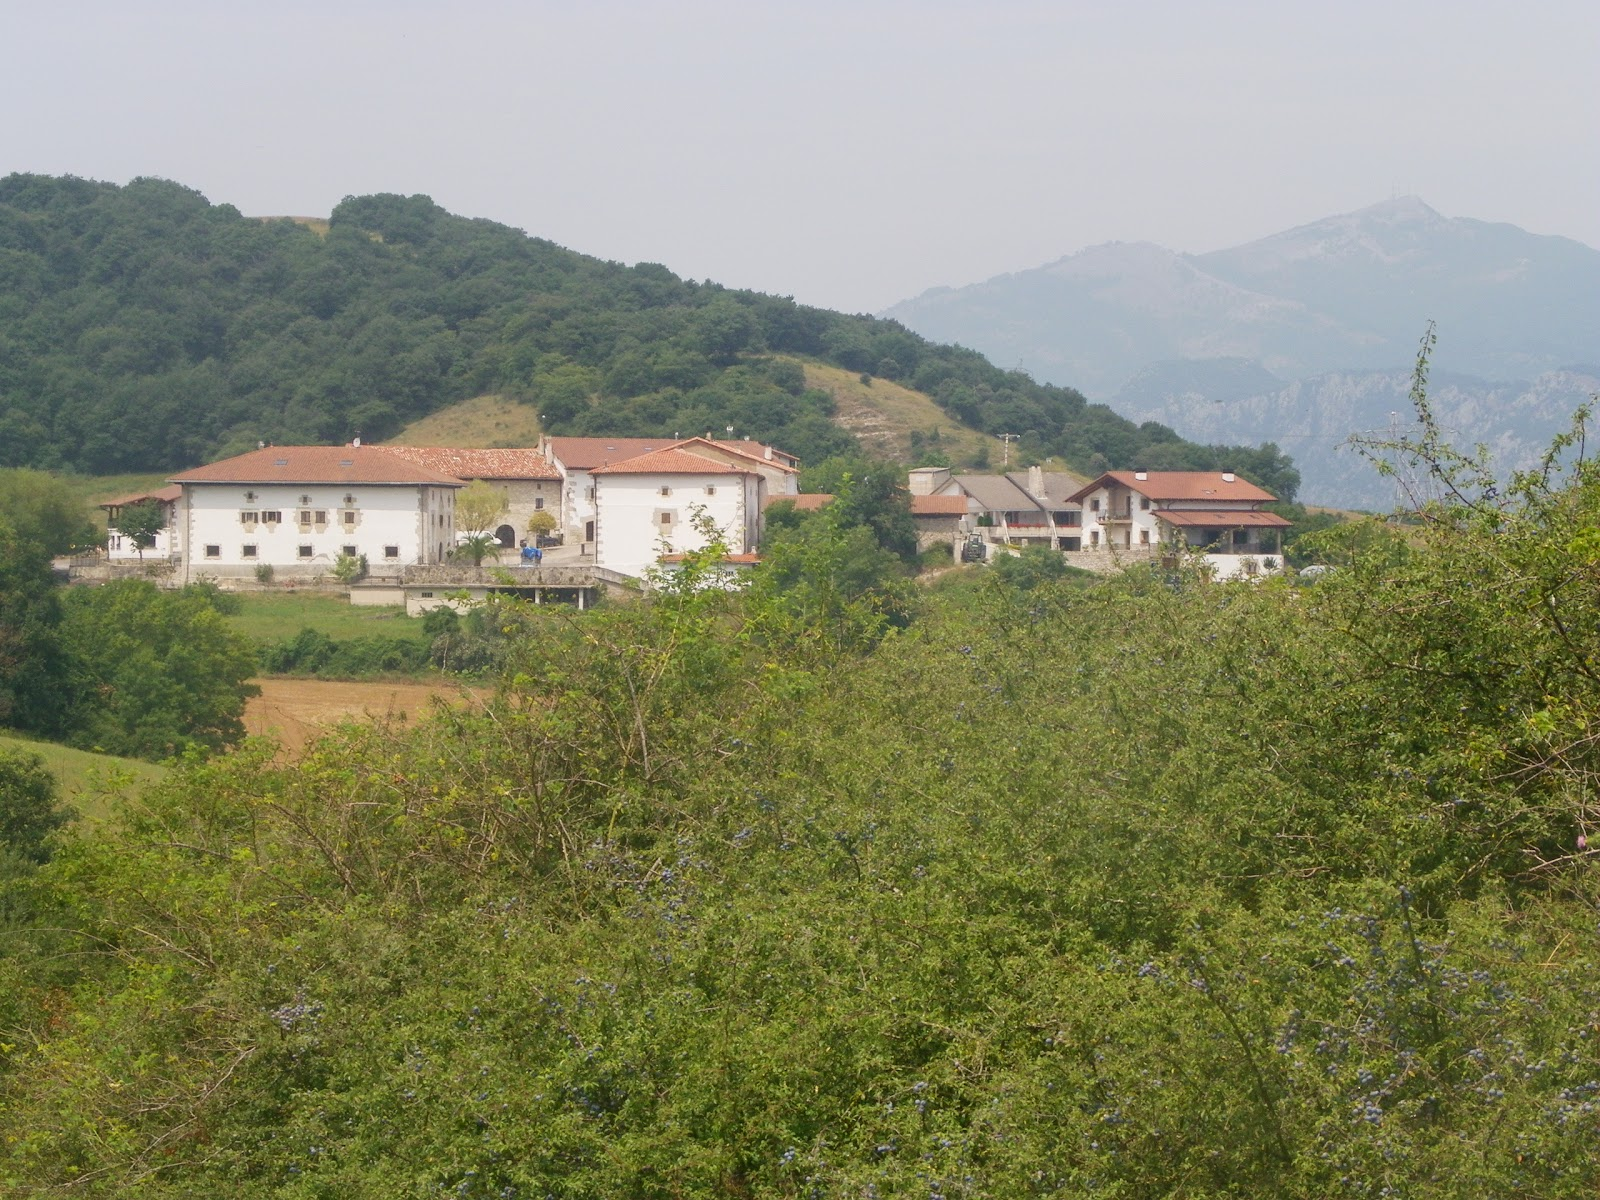 Urritzola